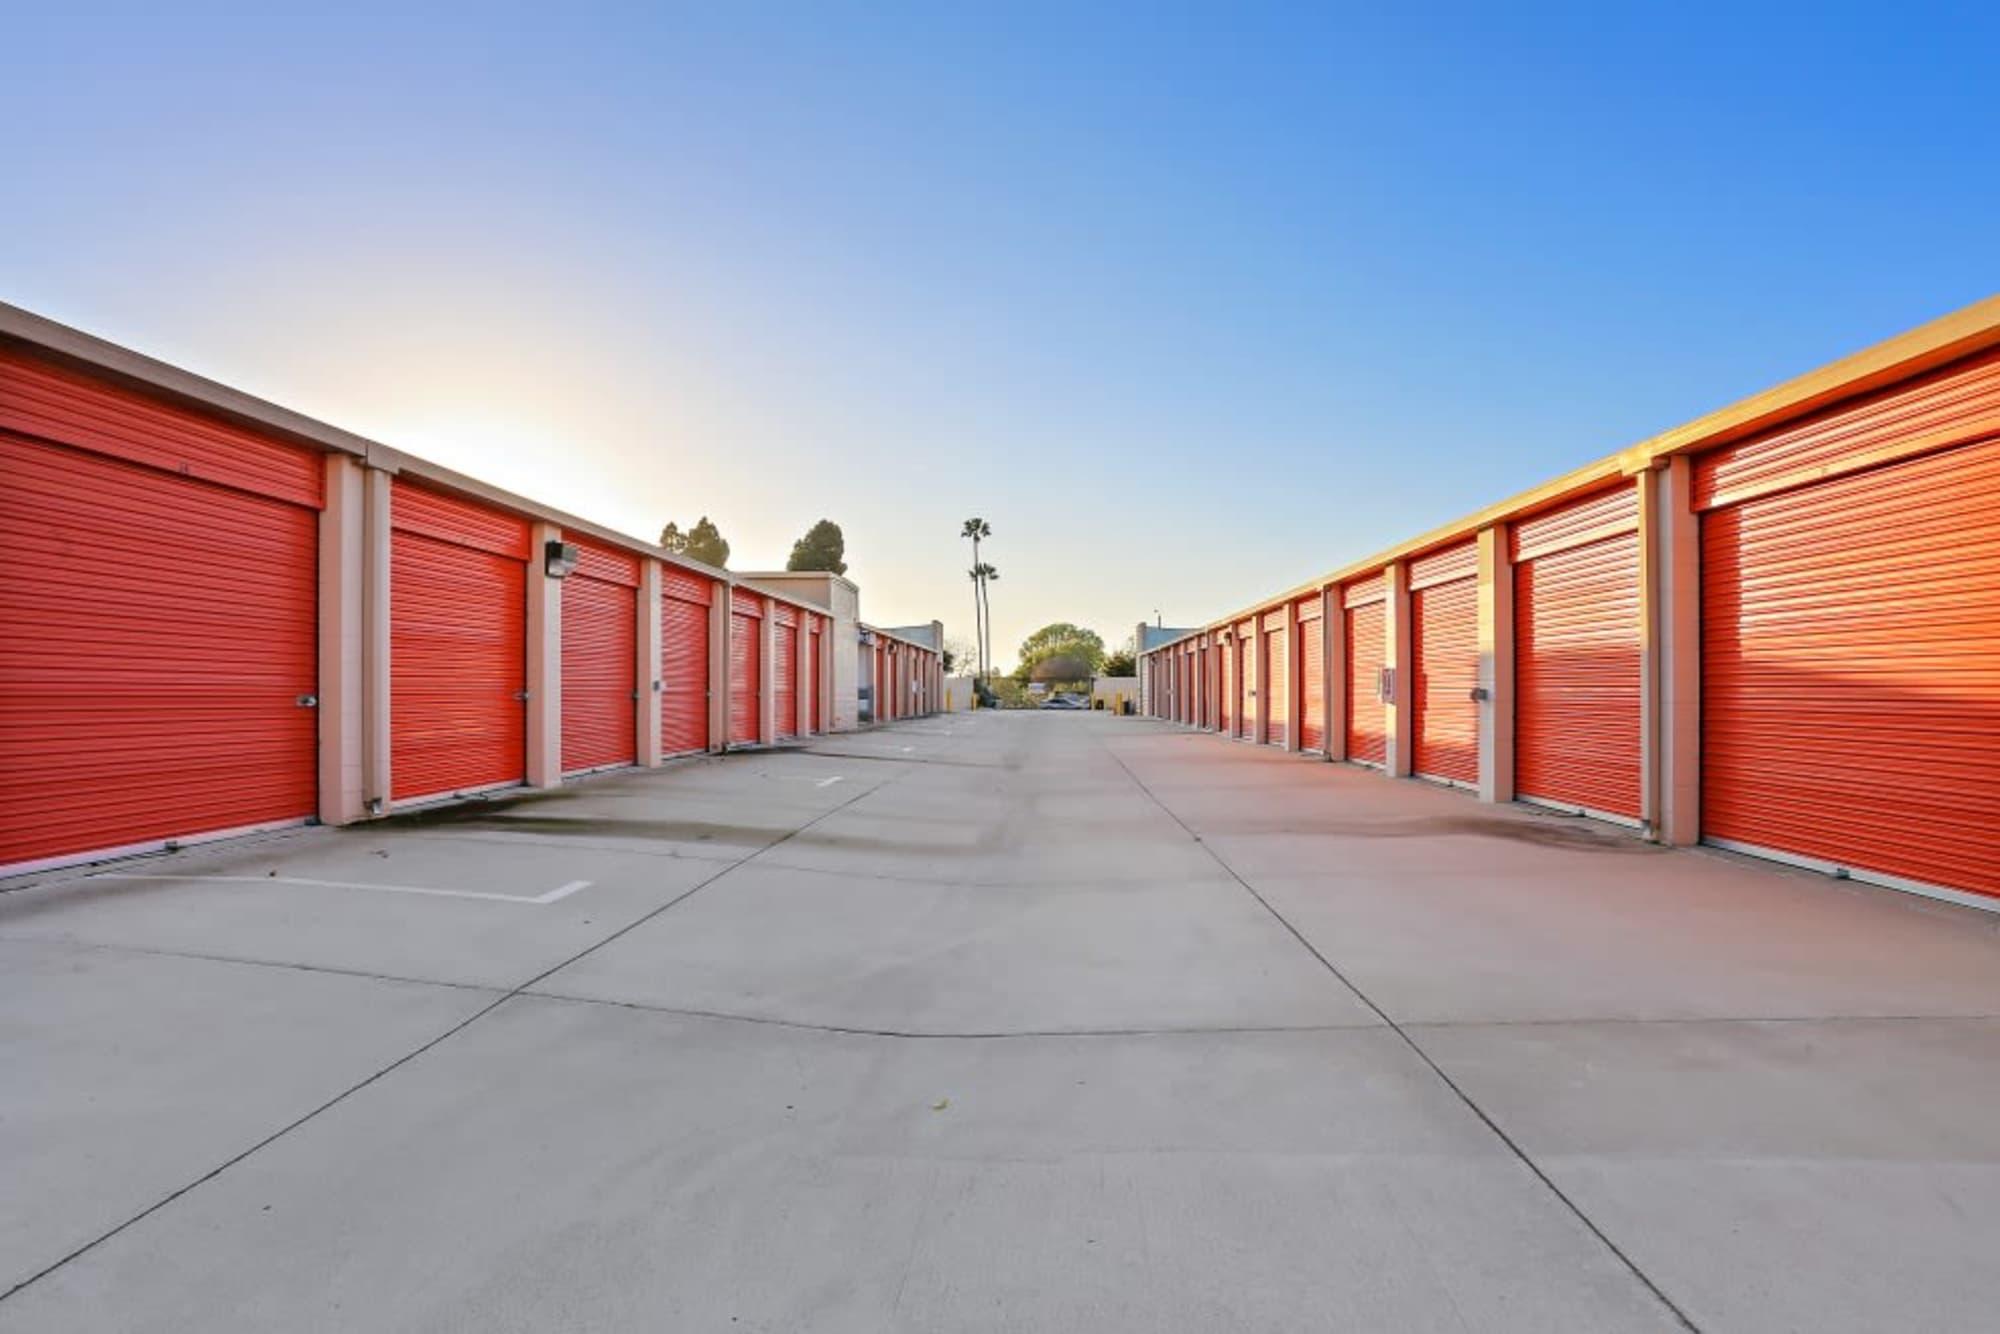 Convenient drive-up storage at A-1 Self Storage in Huntington Beach, California